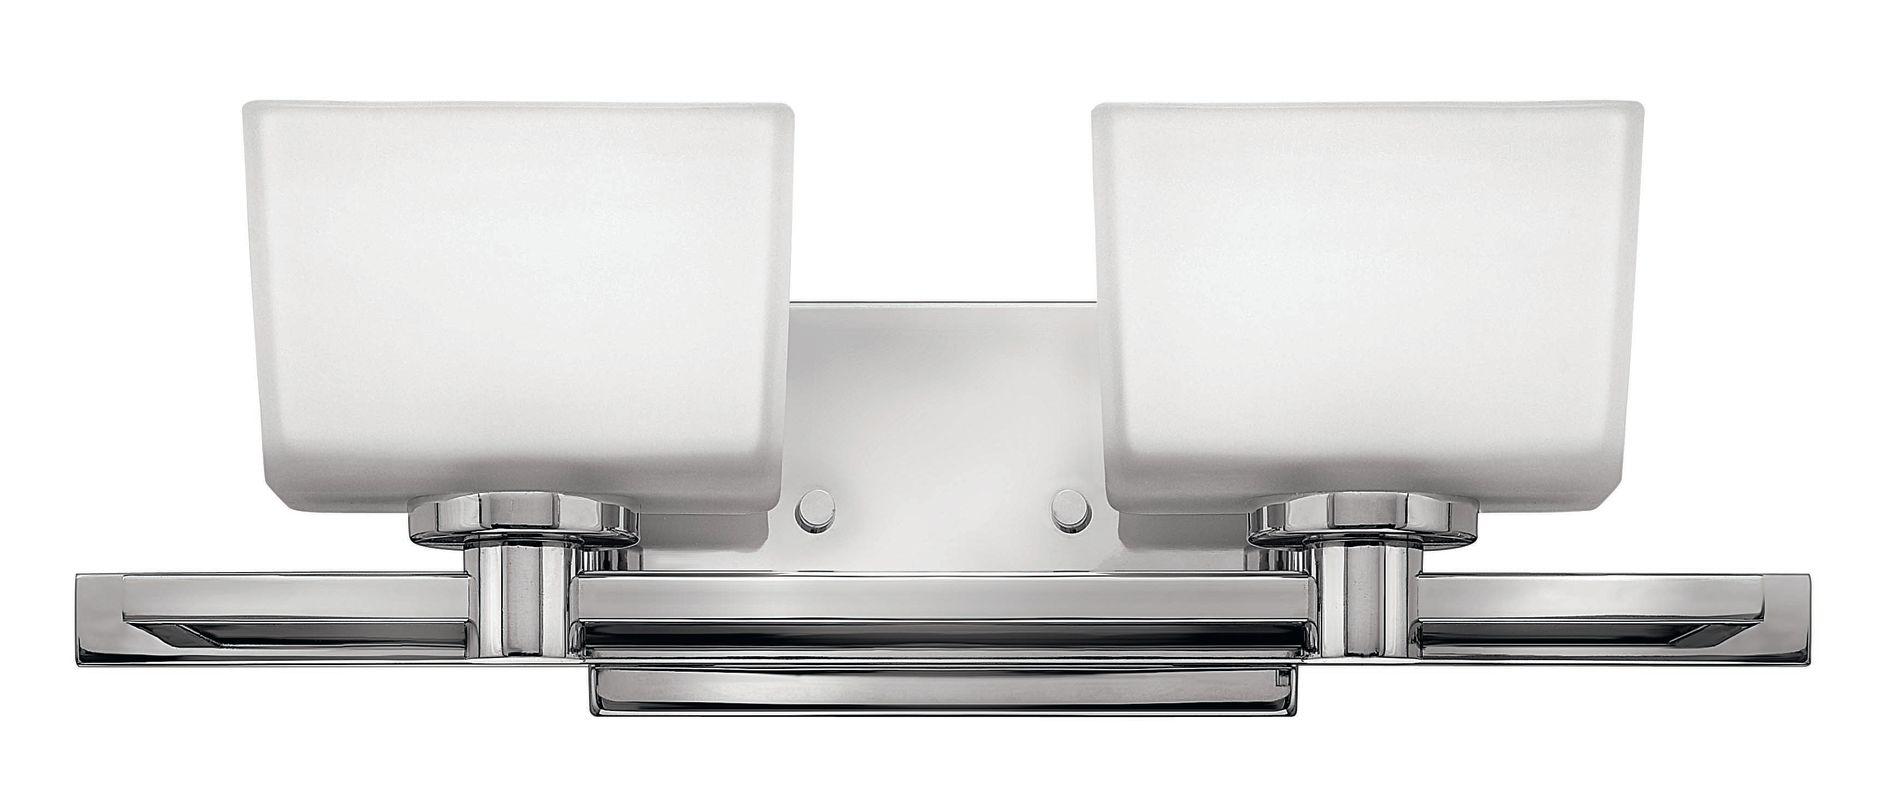 Hinkley Lighting 5022CM Chrome Contemporary Taylor Bathroom Light